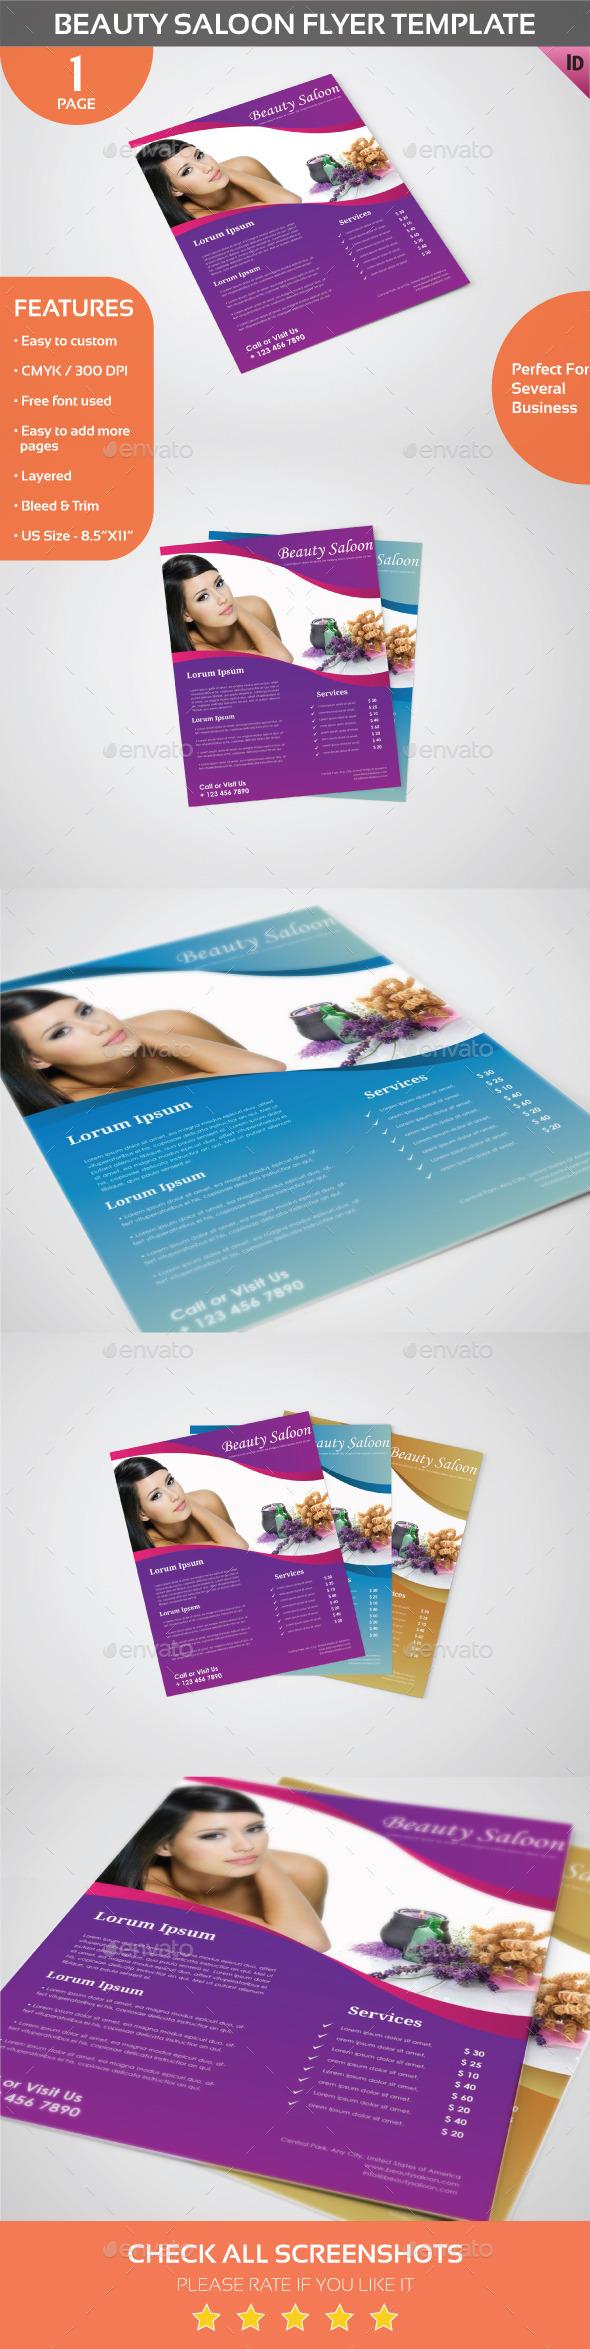 Beauty Salon Flyer Template - Commerce Flyers